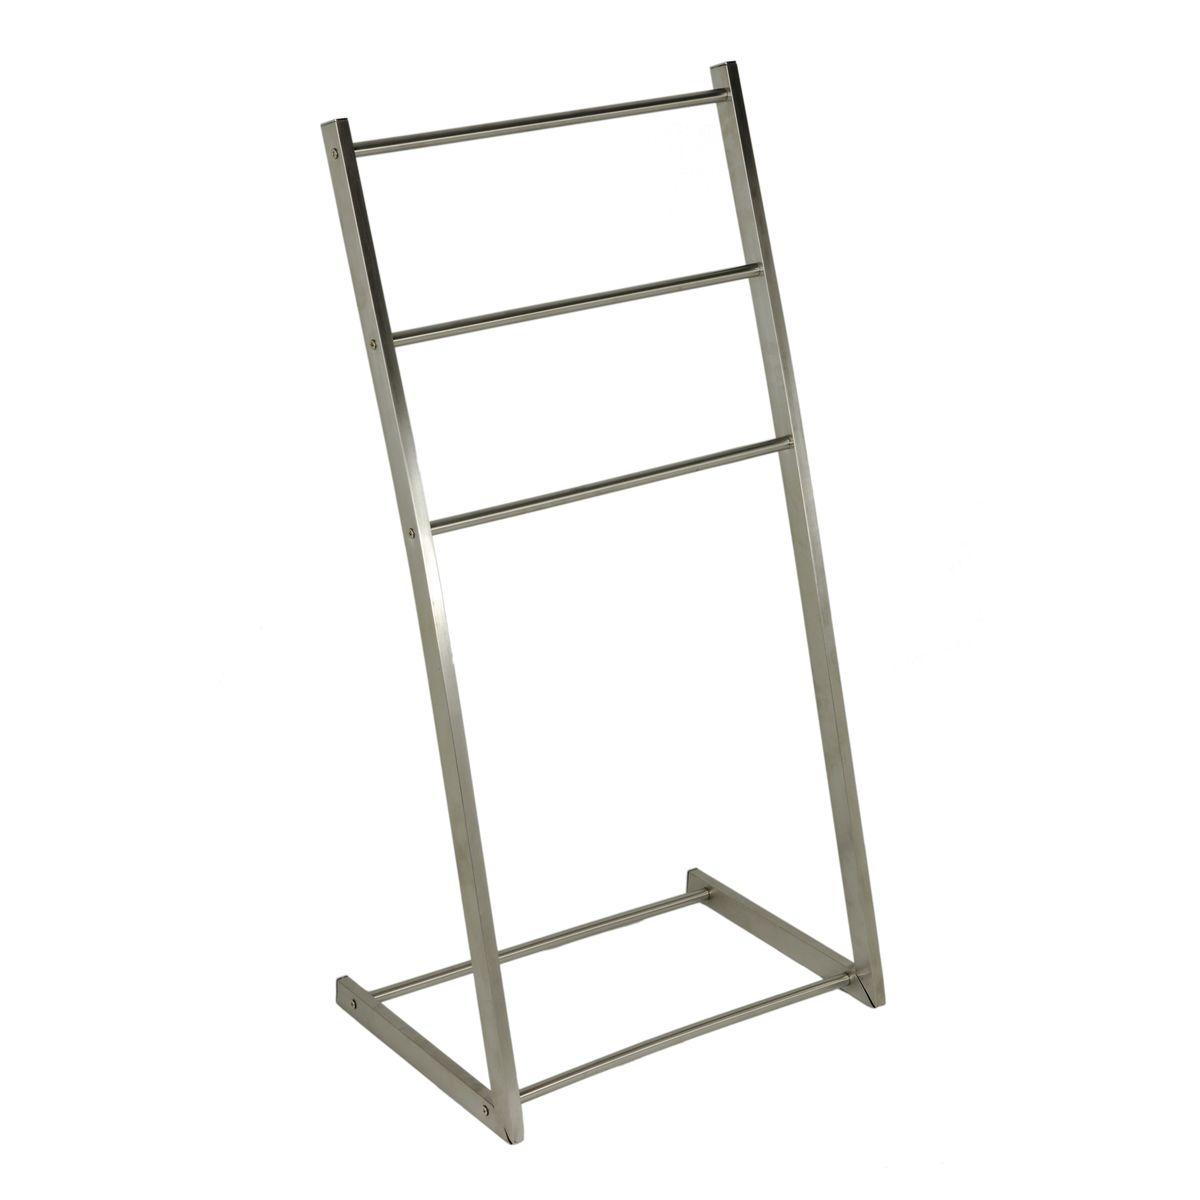 Scala Porta Asciugamani Ikea Creativo Scaletta Rack Pavimento In